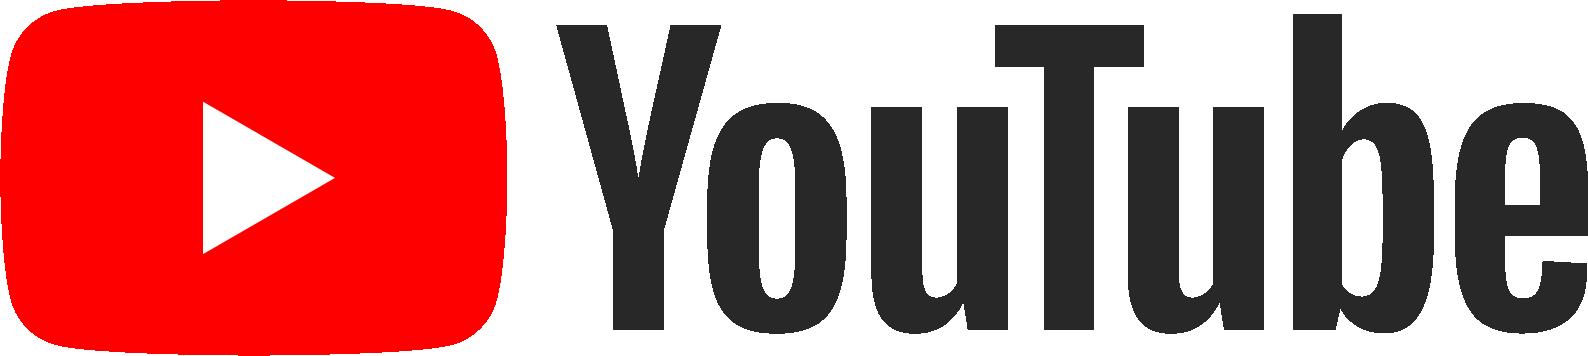 YouTube logo - links to YouTube website